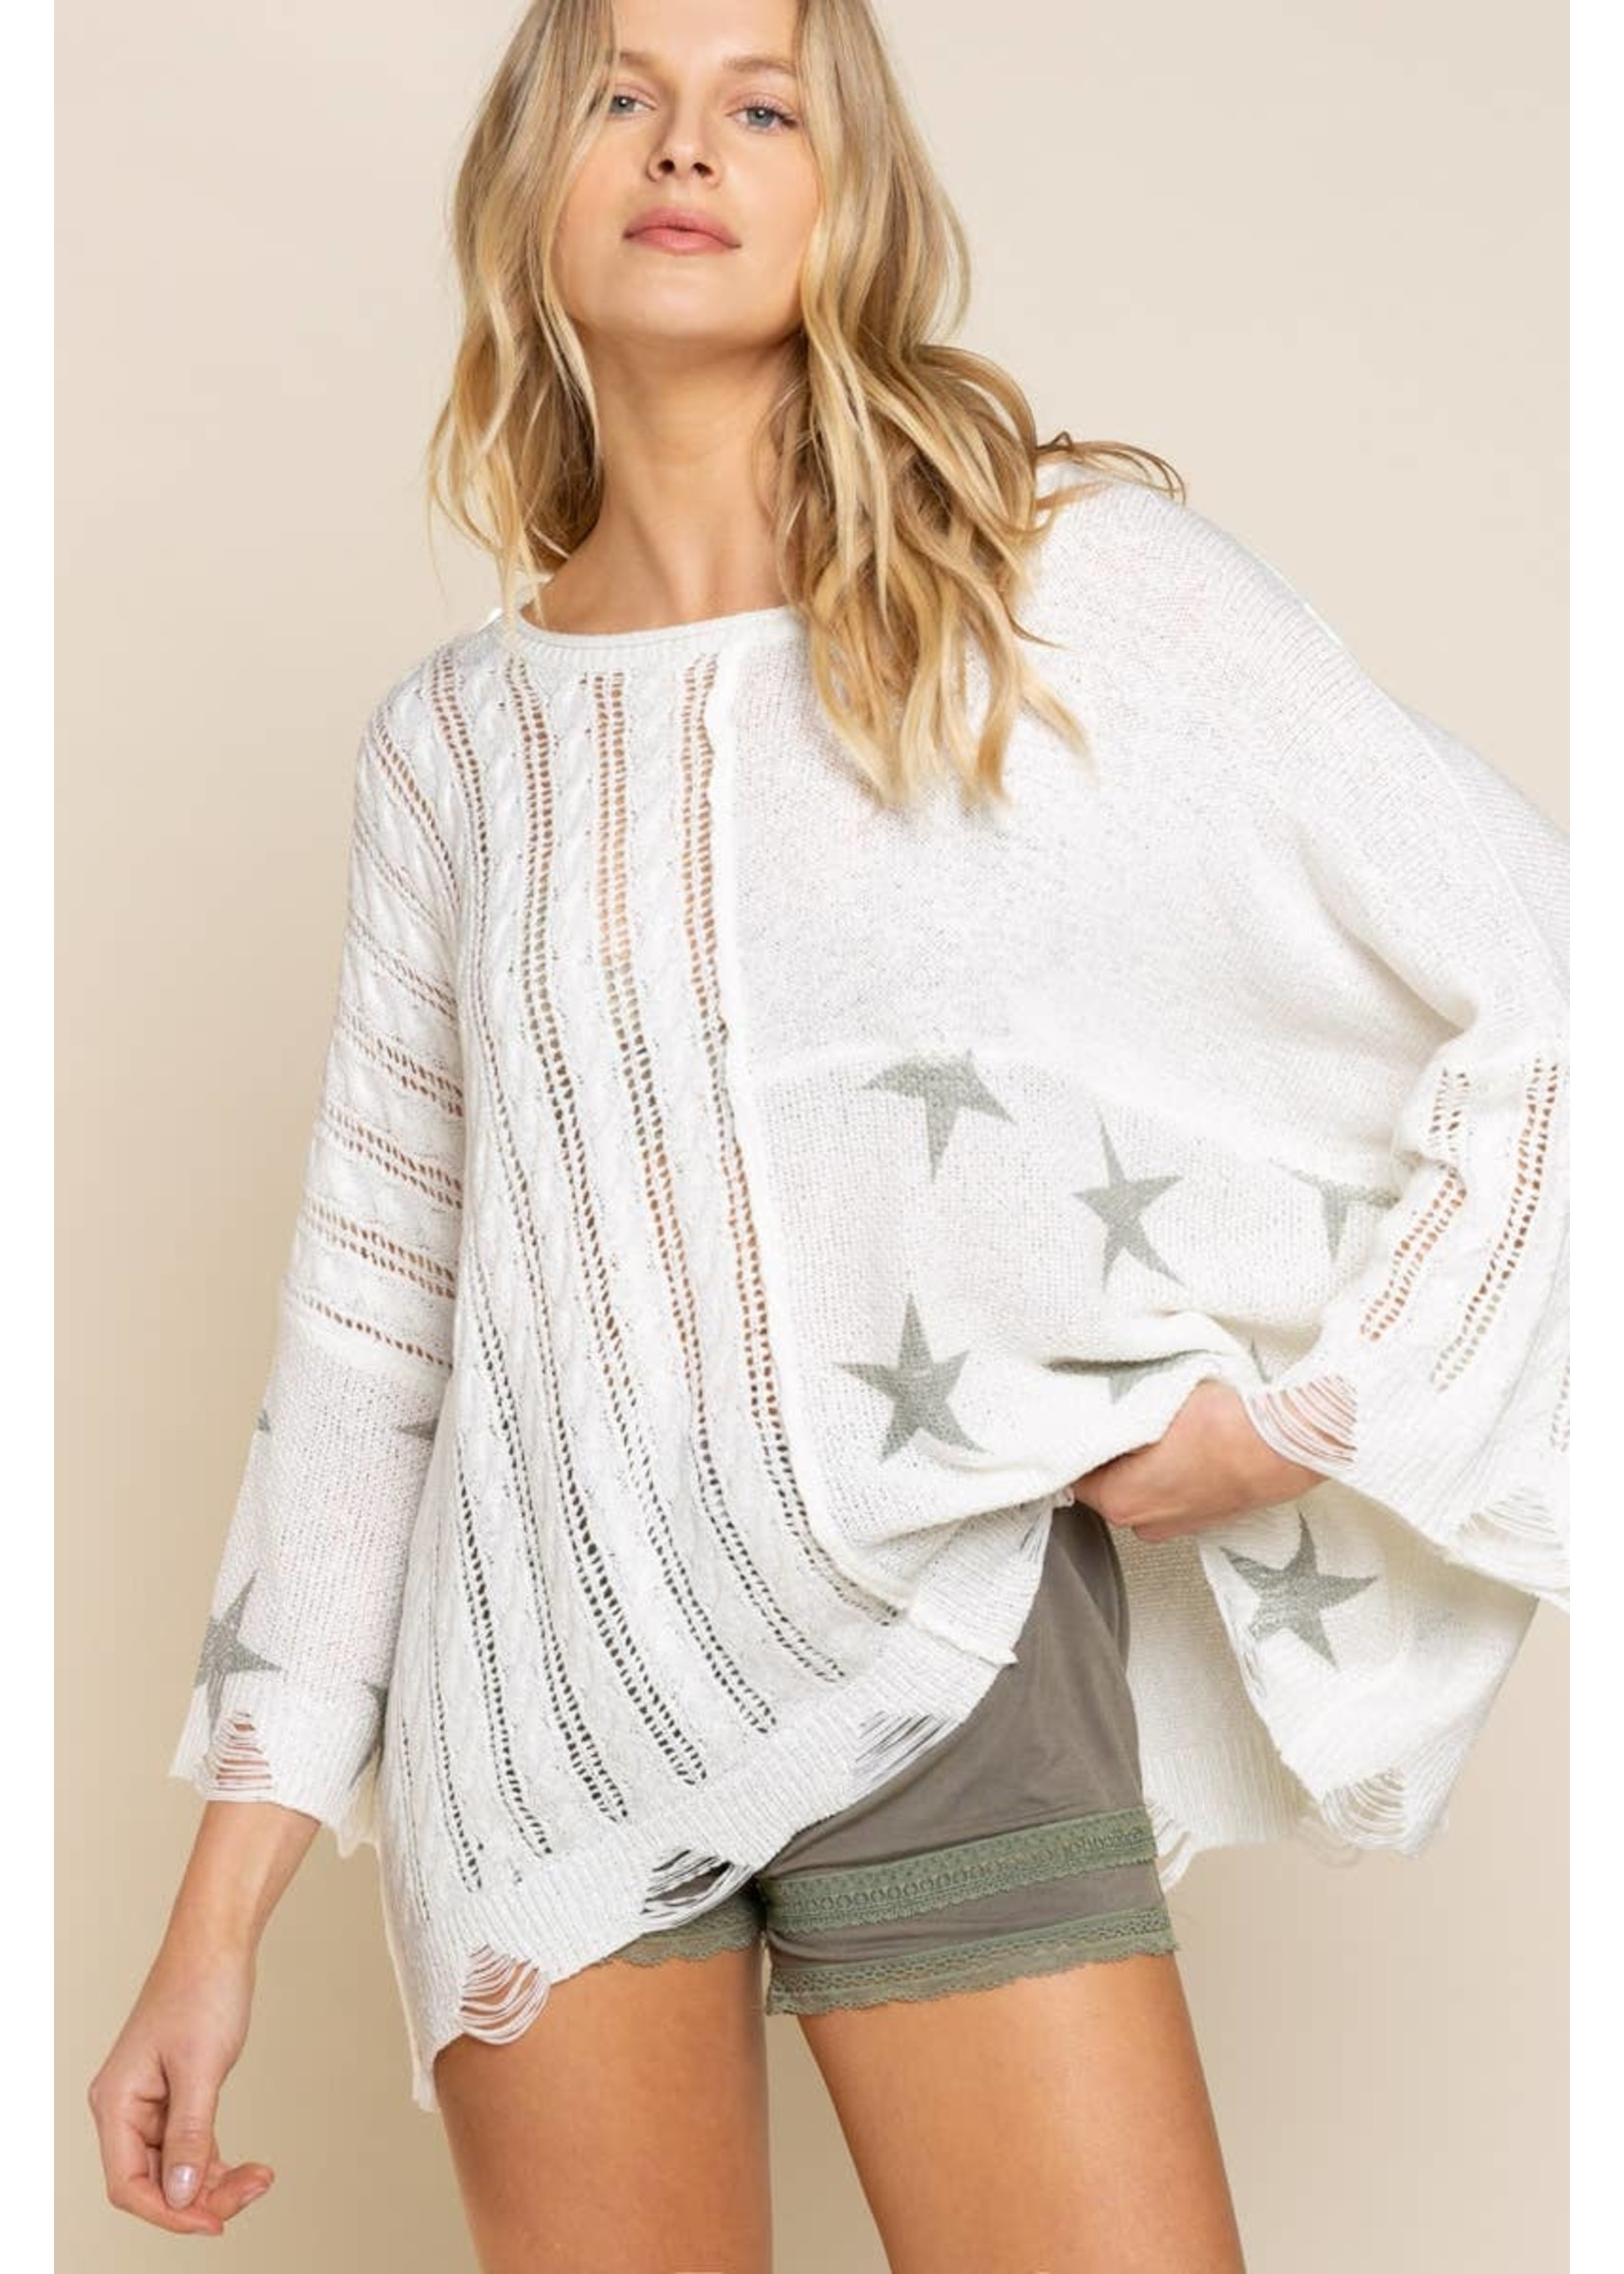 Pol Clothing Stars light weight spring sweater-cream